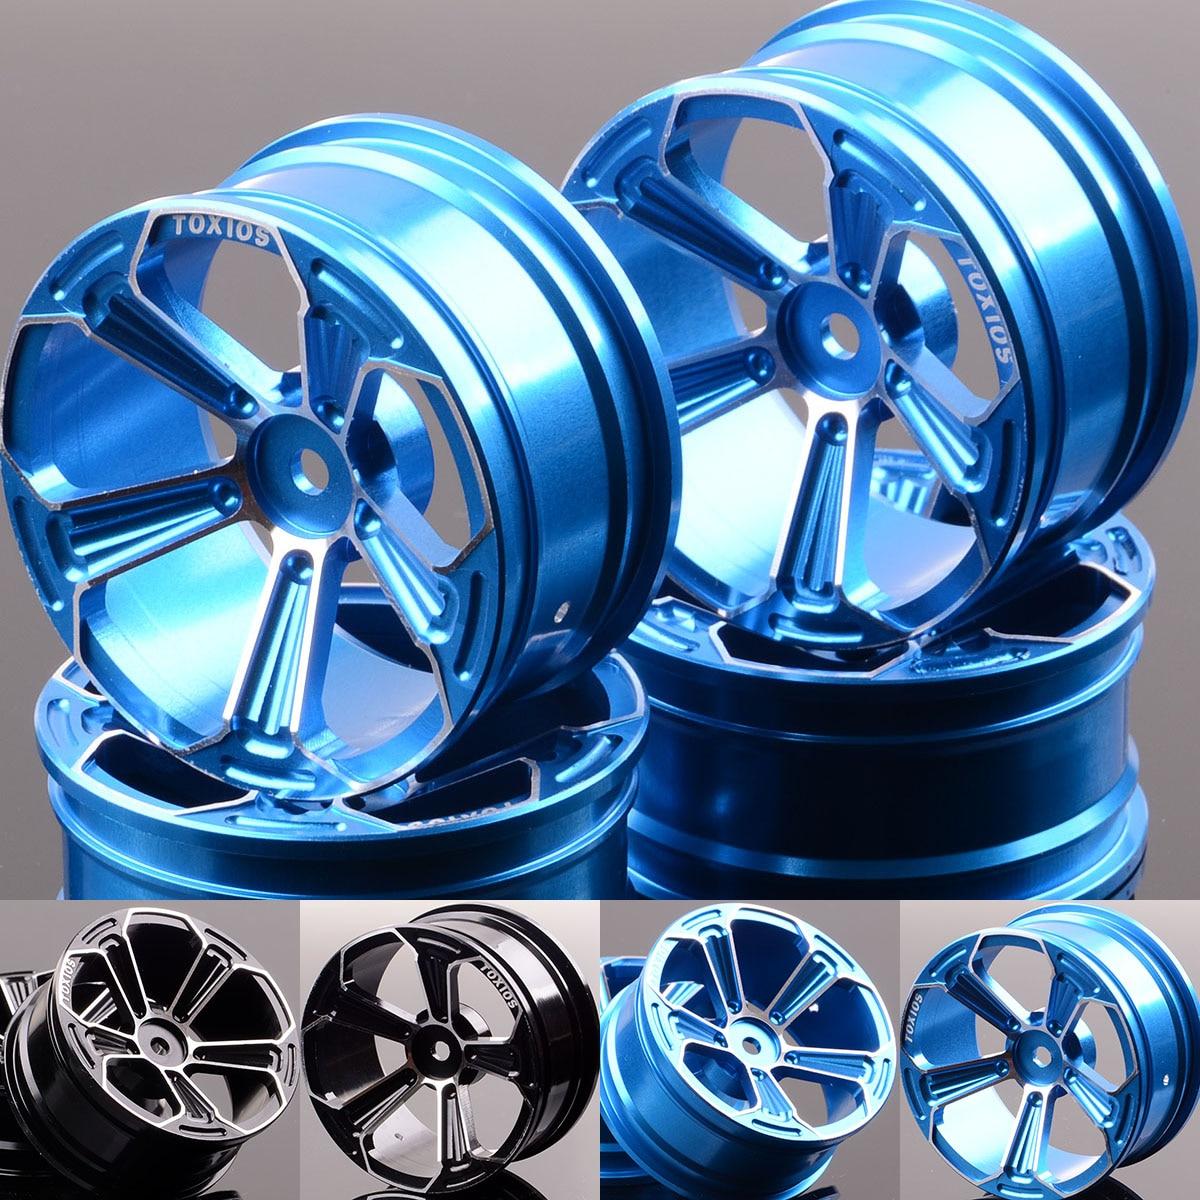 4P Aluminum 5 Spoke Wheels/Rims 1053 For RC 1/10 On-Road Drift Sakura HSP Tamiya